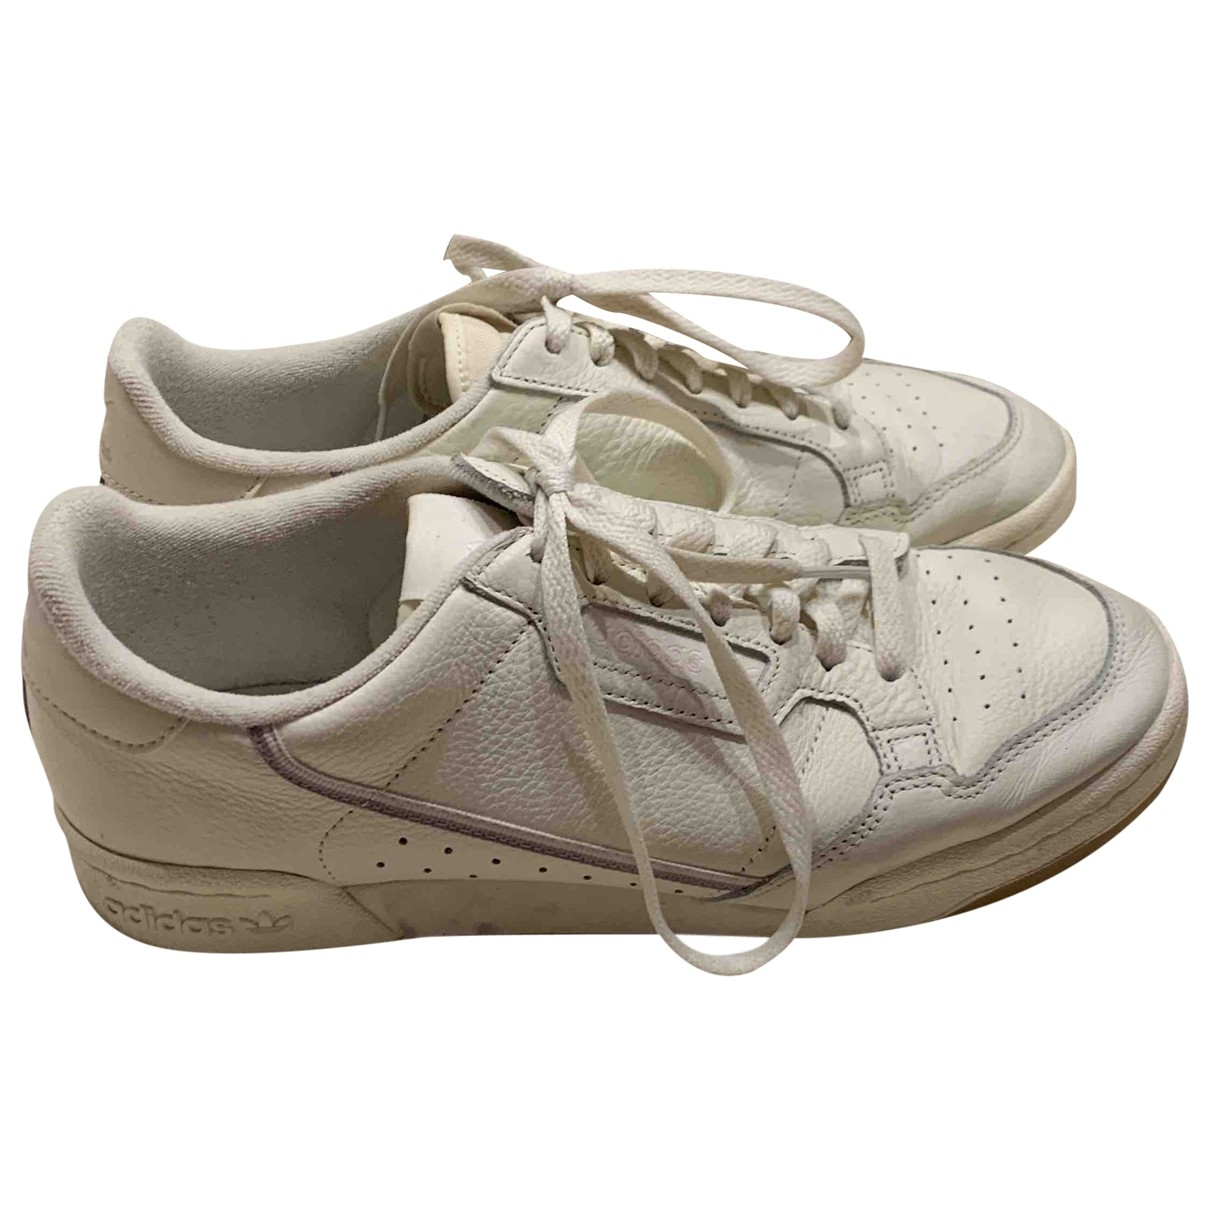 Adidas - Baskets Continental 80 pour femme en cuir - blanc